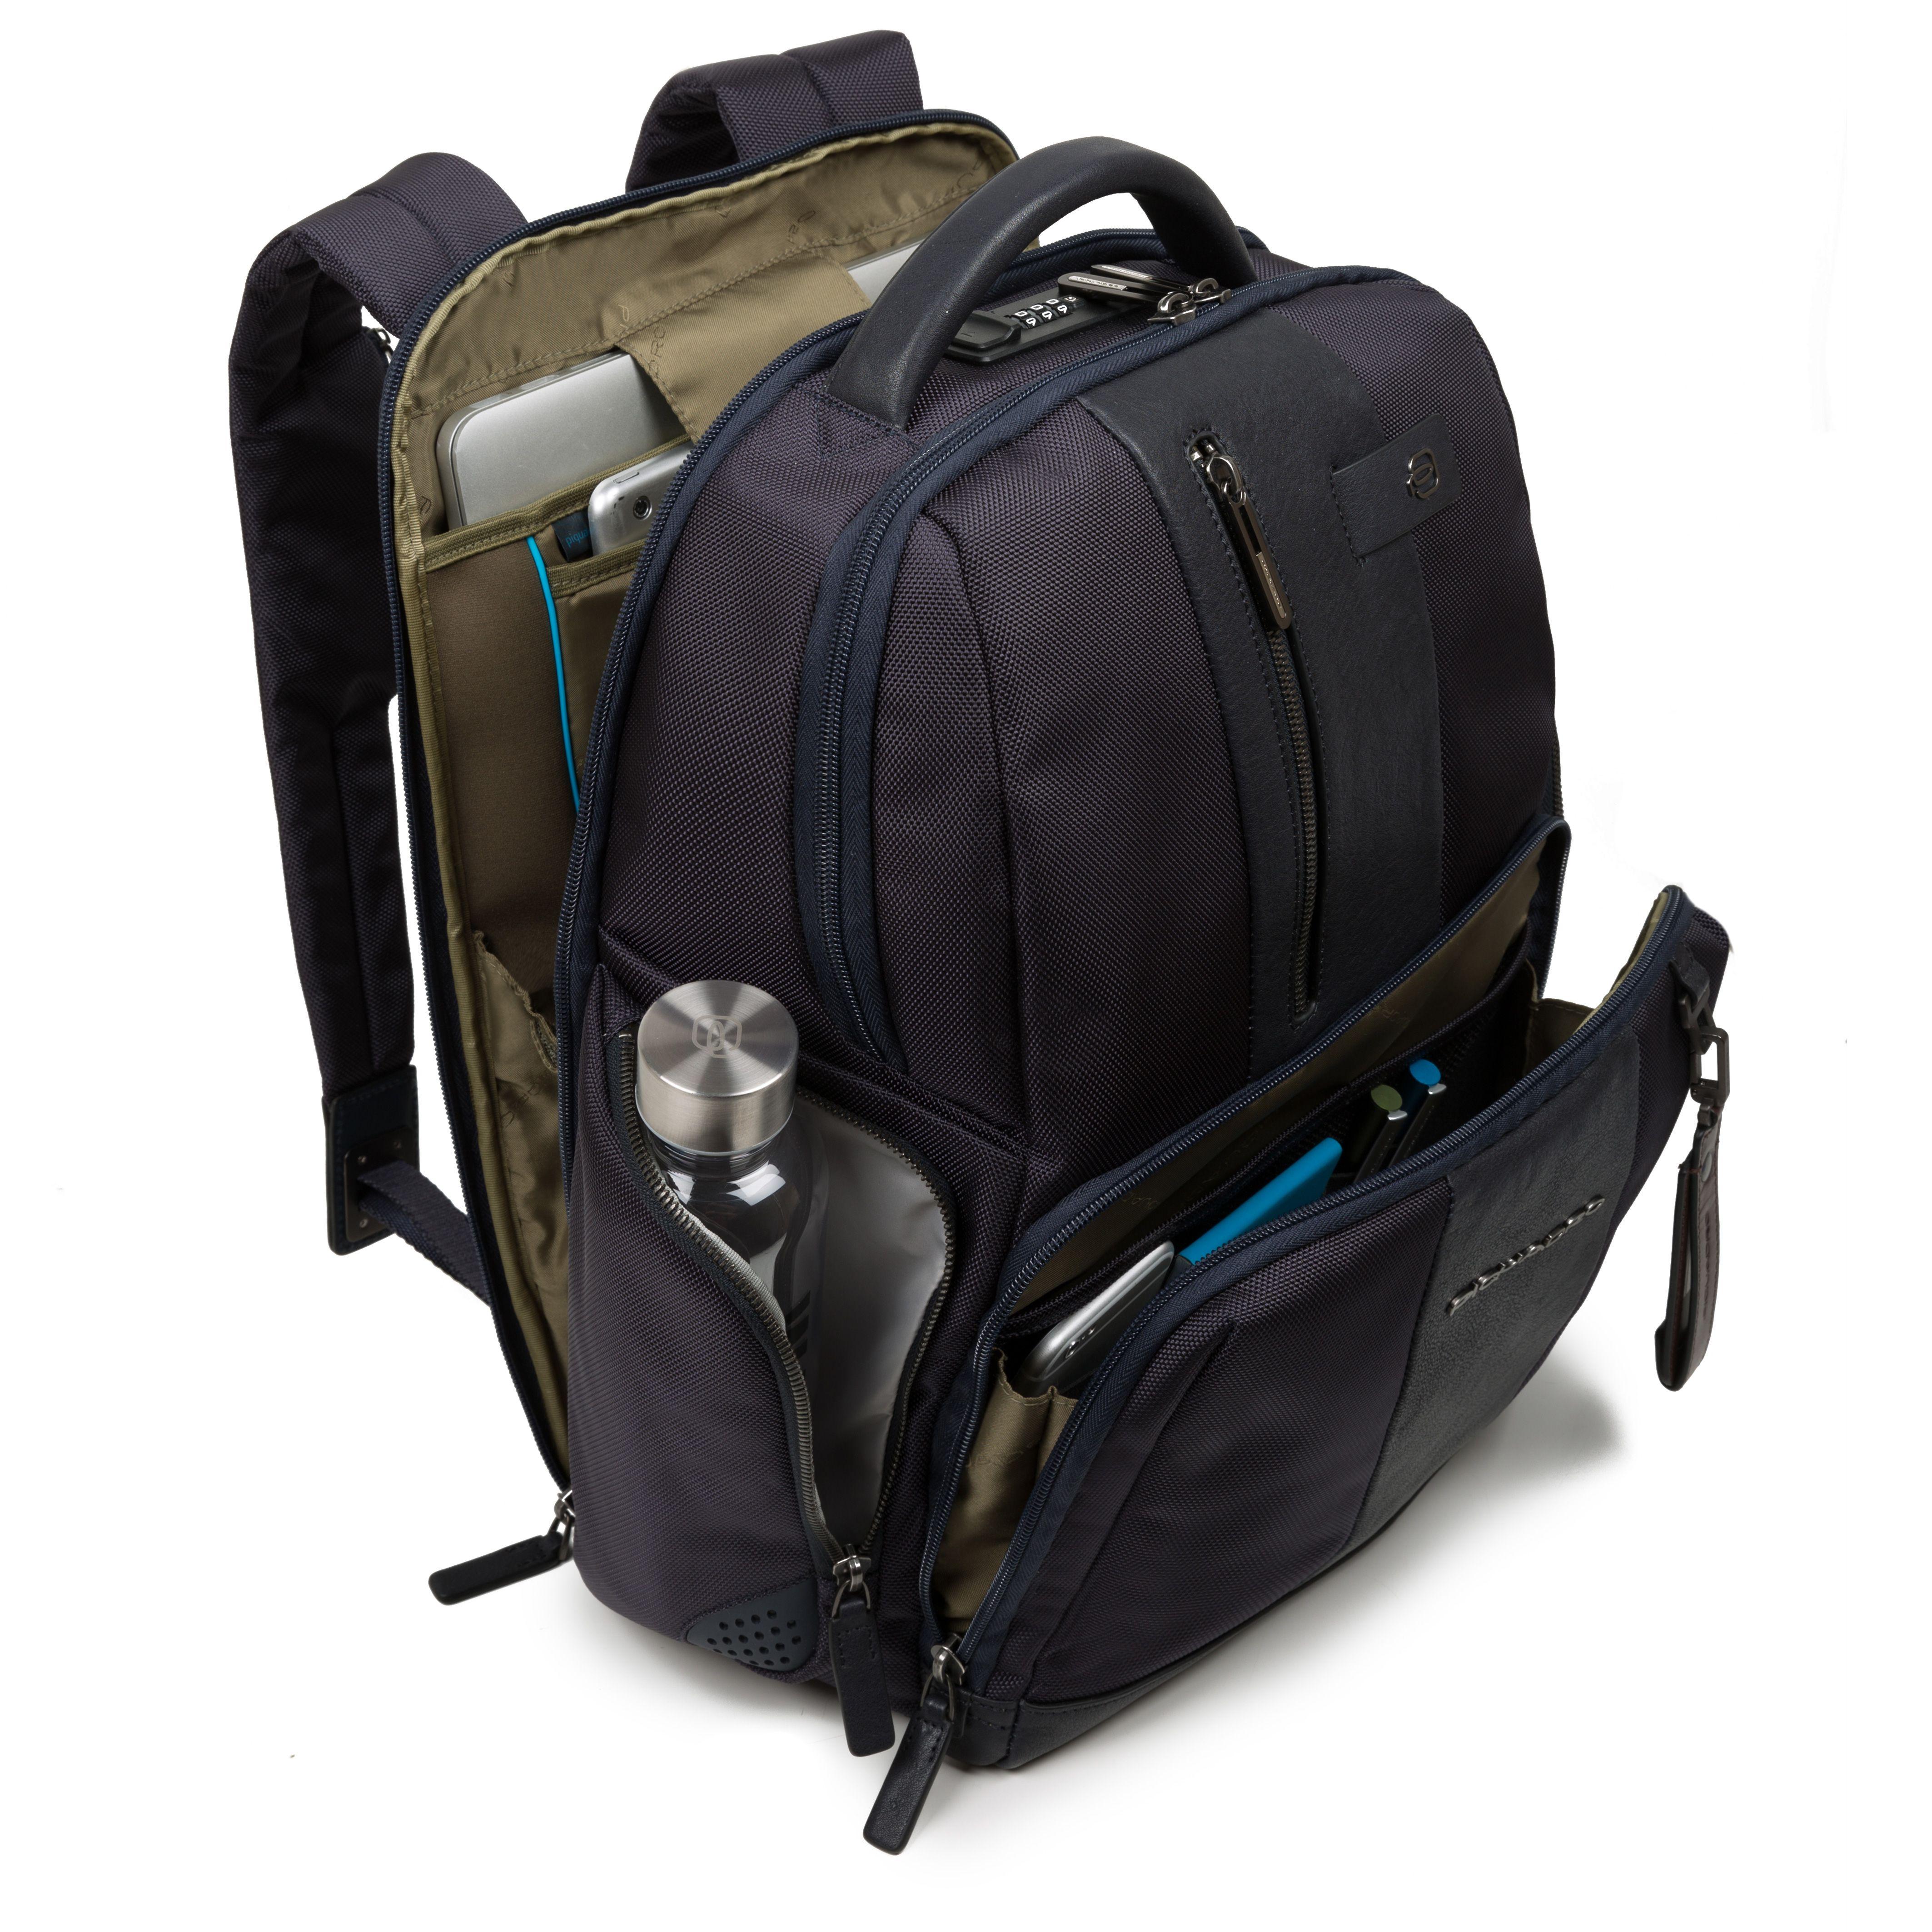 e9bbdbbbba Piquadro - Zaino Piquadro linea Brief, fast-check porta PC/iPad®Air ...